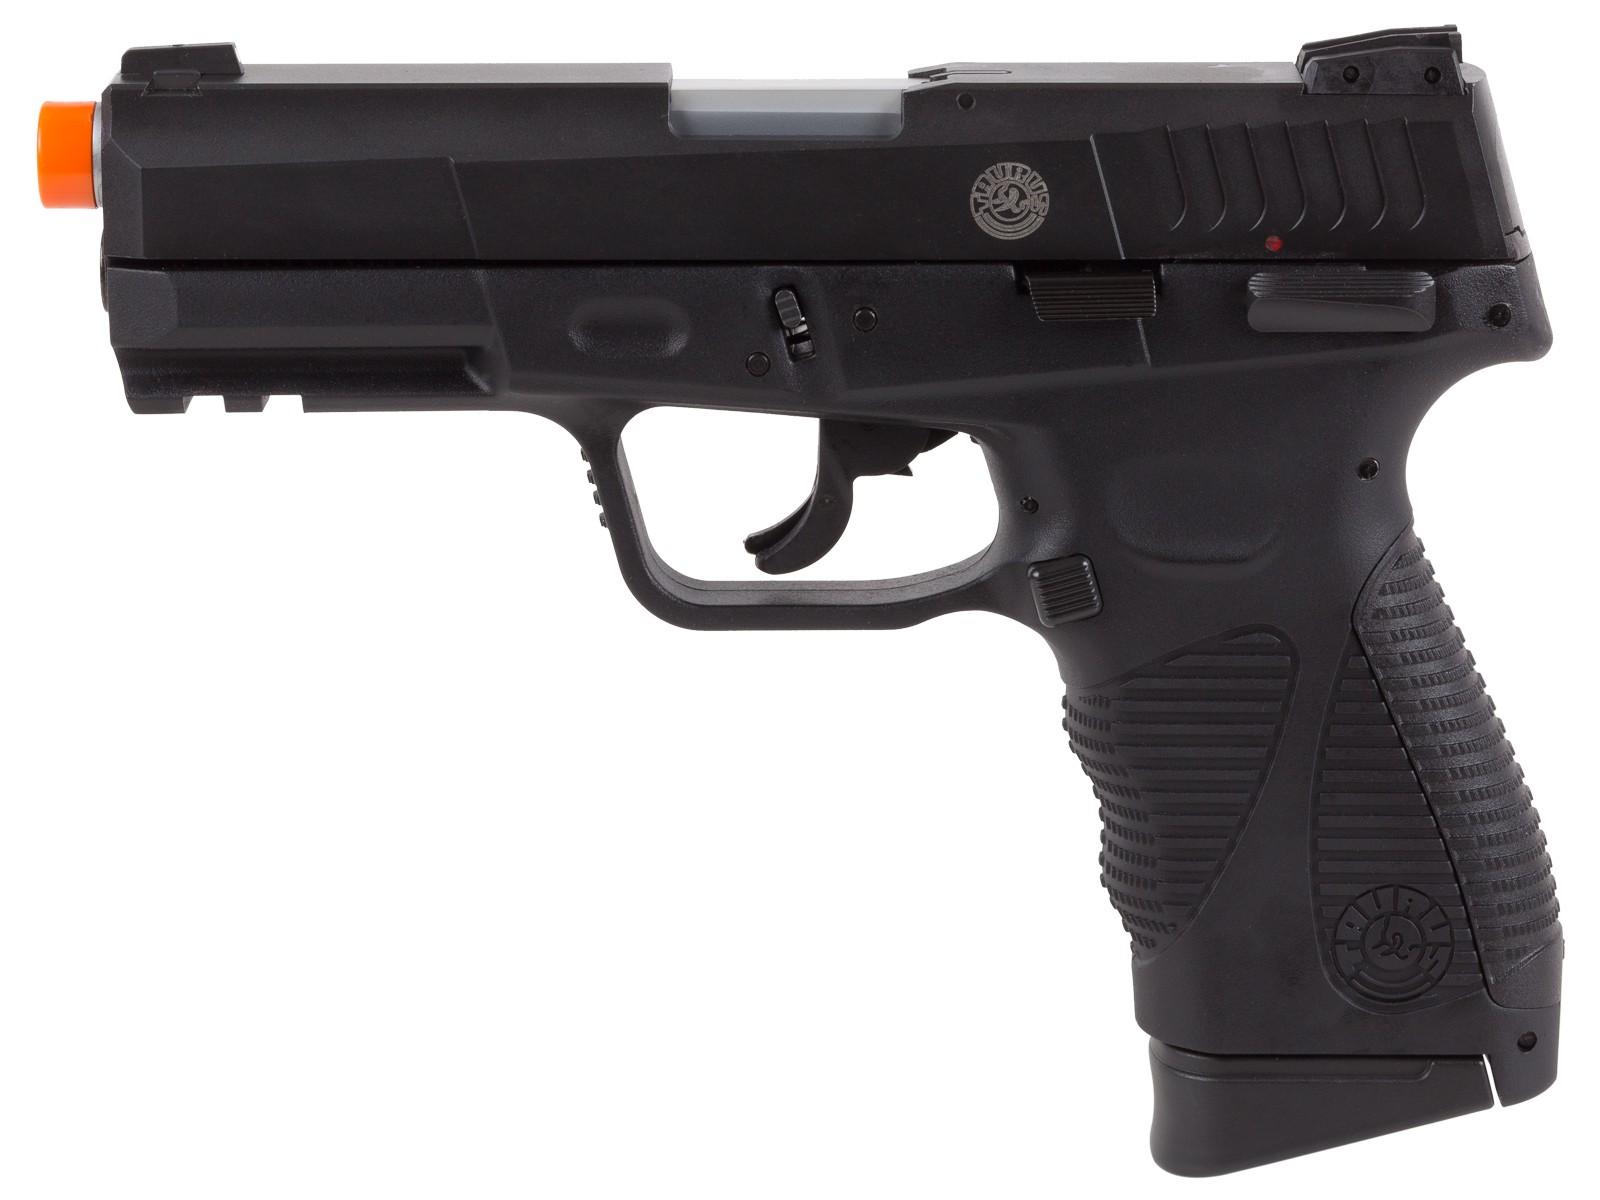 Taurus_PT247_G2_Airsoft_CO2_Blowback_Black_6mm